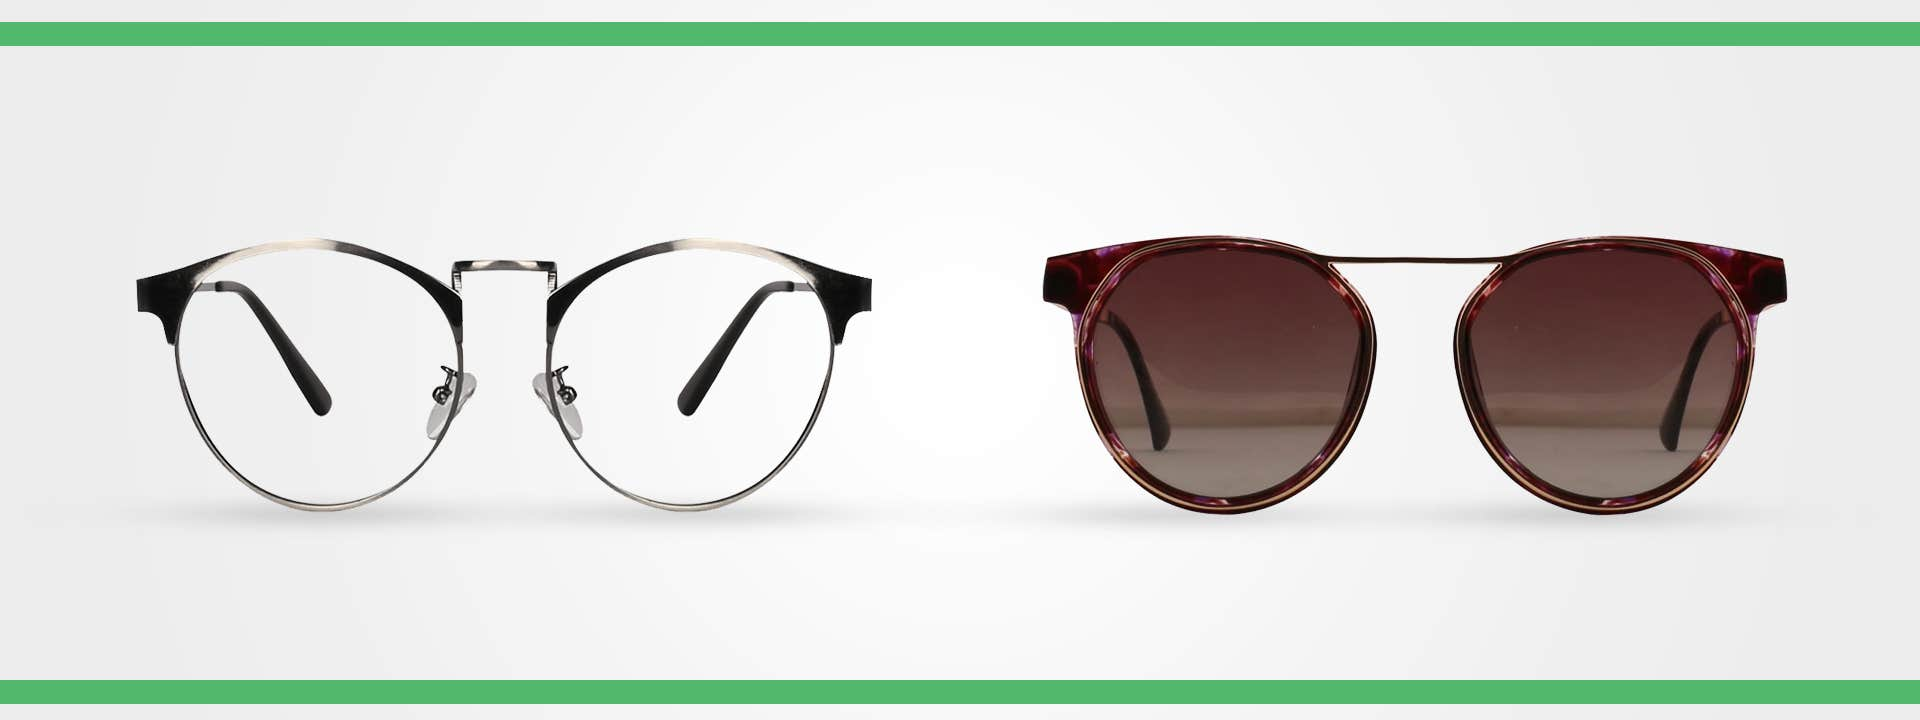 Buy Sunglasses and Eyeglasses